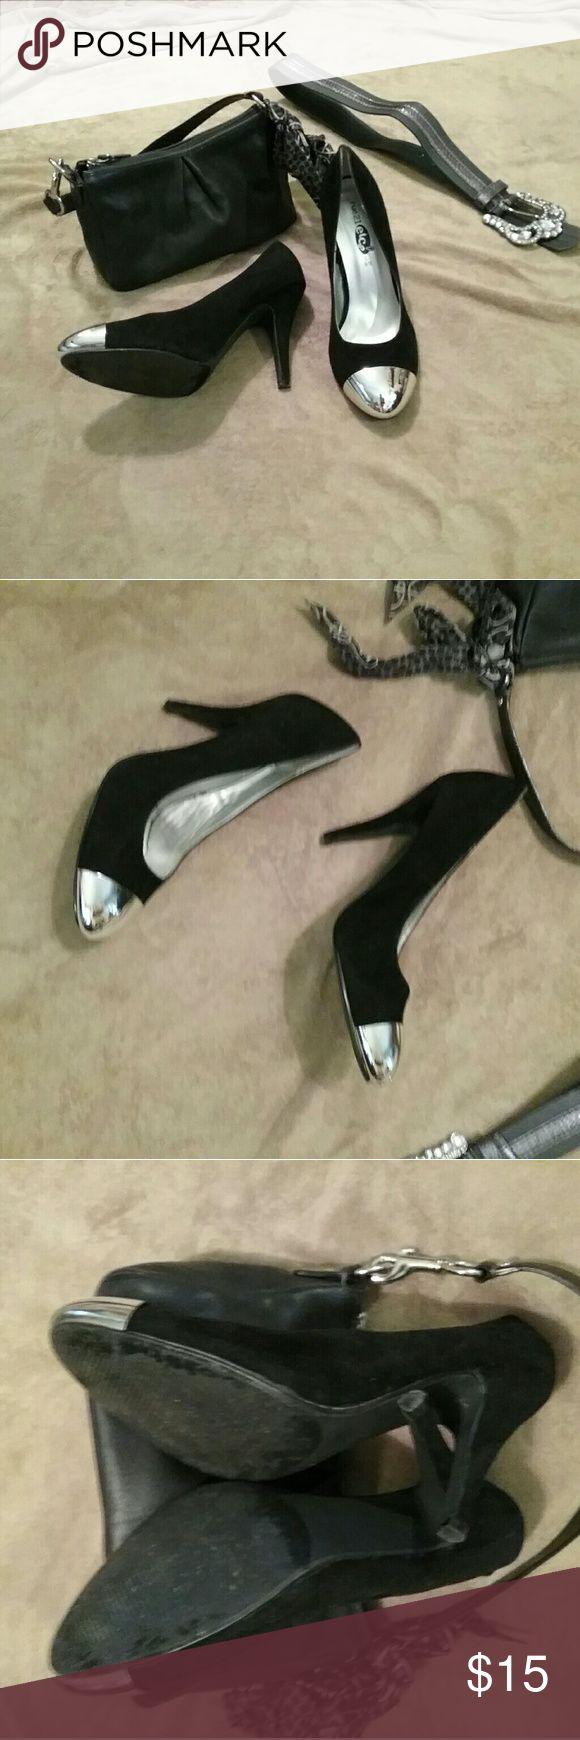 Rue 21 ETC high heels 👠  Classy and stylish  👠  Rueda 21 ETC  👠  Black velvet with a silver toe  👠 sz L 8/9  👠  item #B16 Rue 21 Shoes Heels